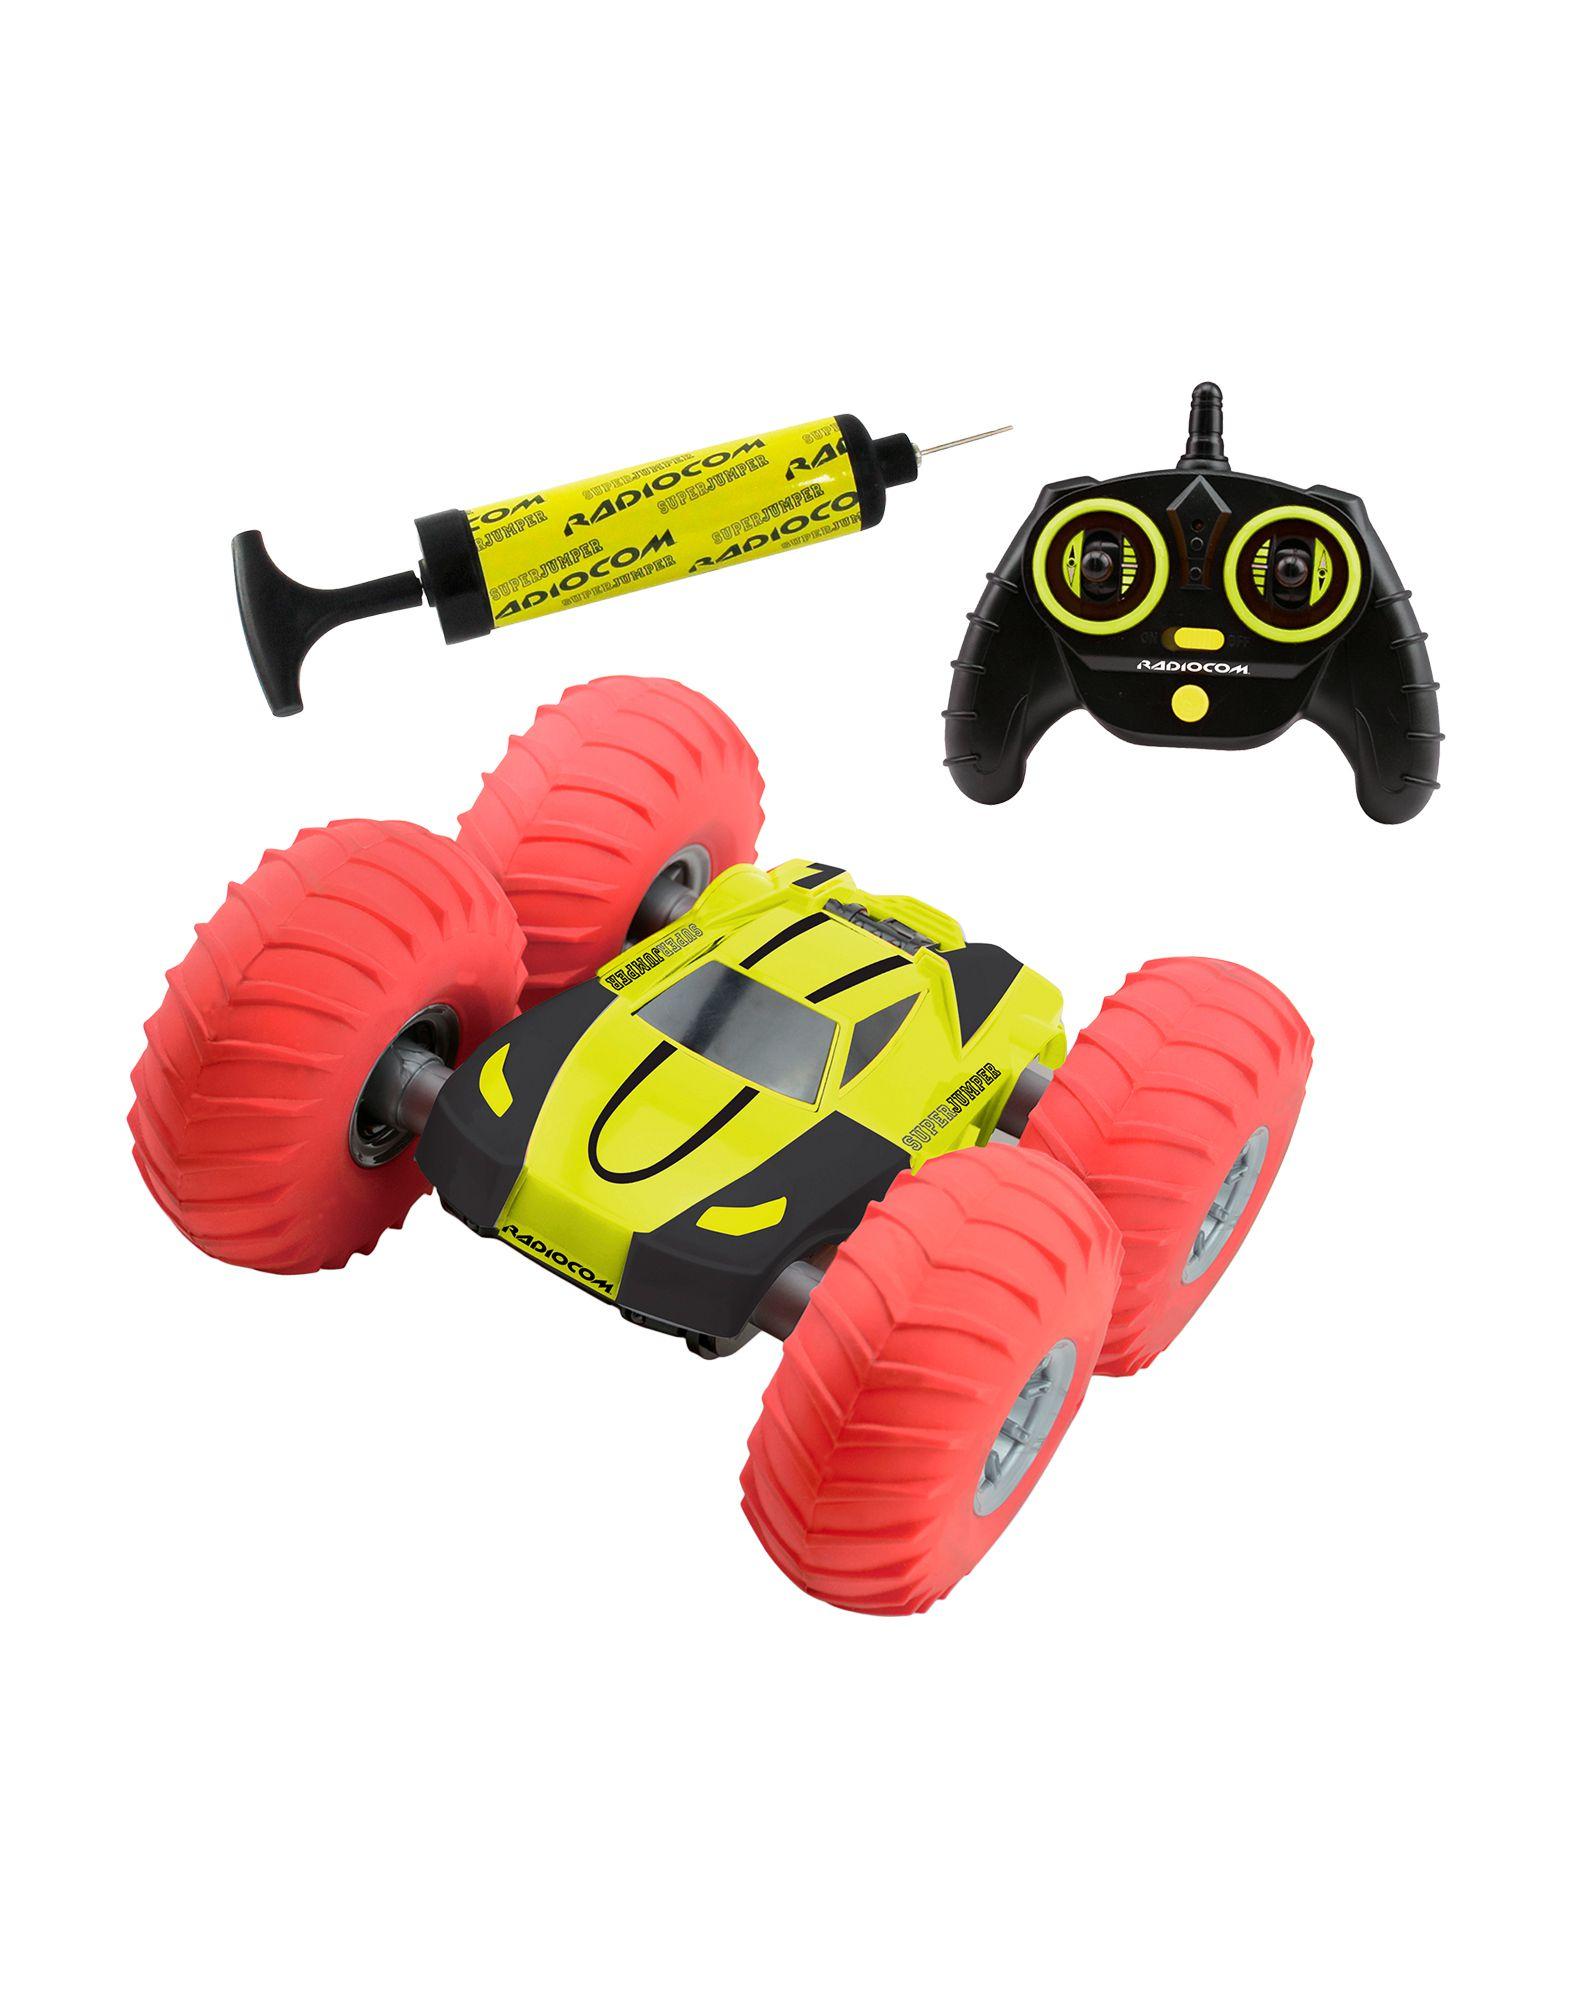 YOOX.COM(ユークス)《セール開催中》RADIOCOM ボーイズ 3-8 歳 ミニカー/電車/飛行機ほか イエロー プラスティック